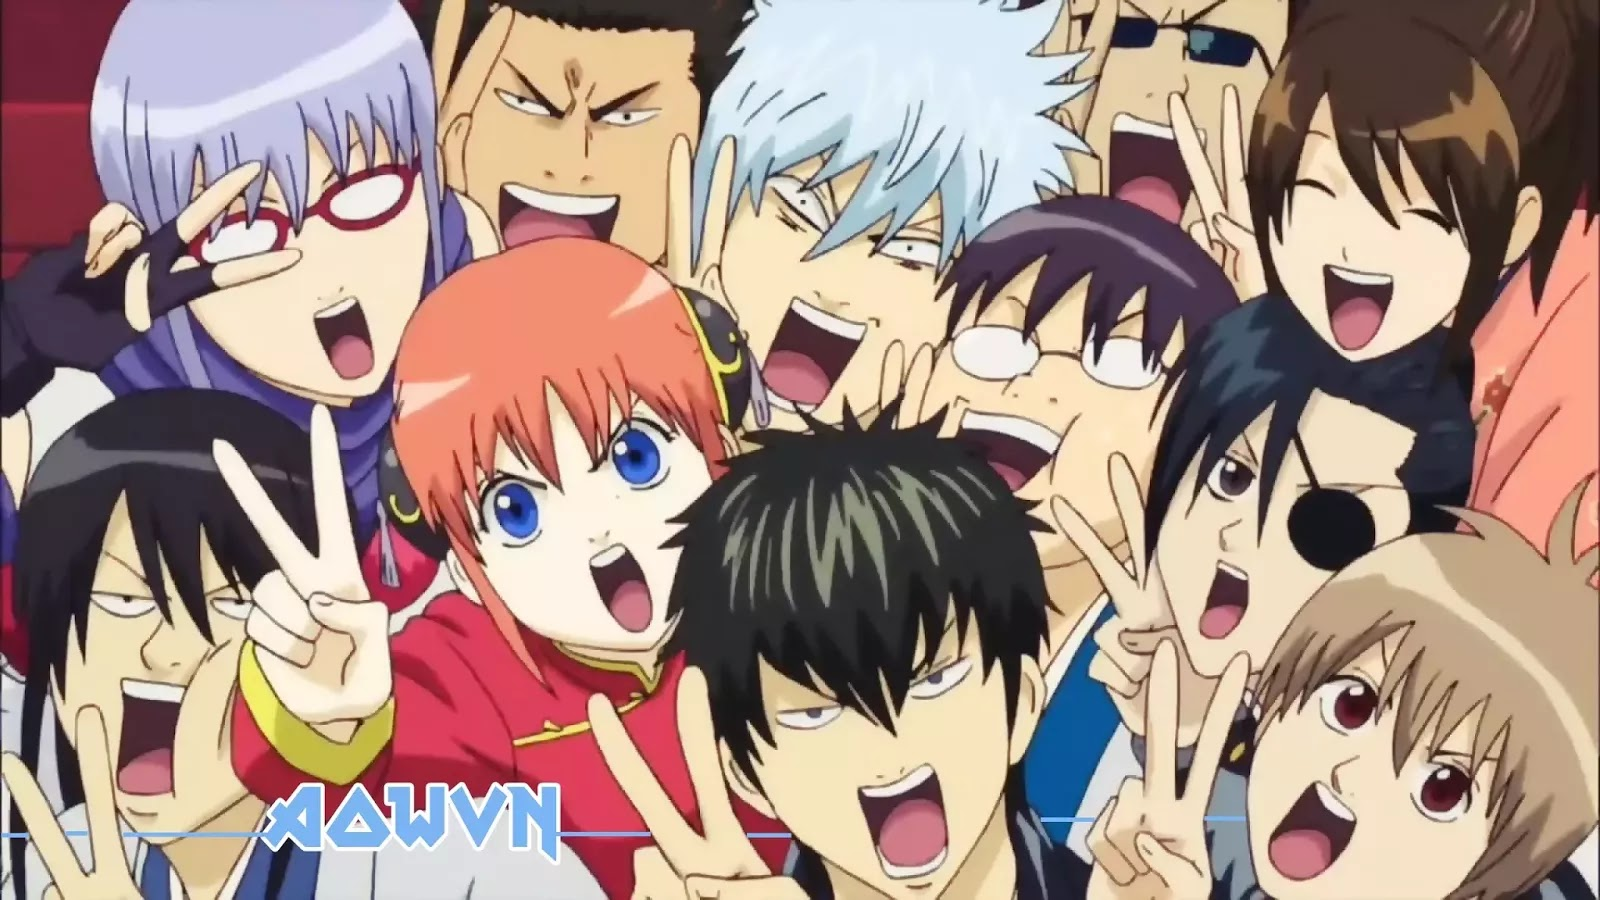 aowvn min m%2B%25283%2529 - [ Anime 3gp Mp4 ] Gintama Porori-hen | Vietsub - Max Hài